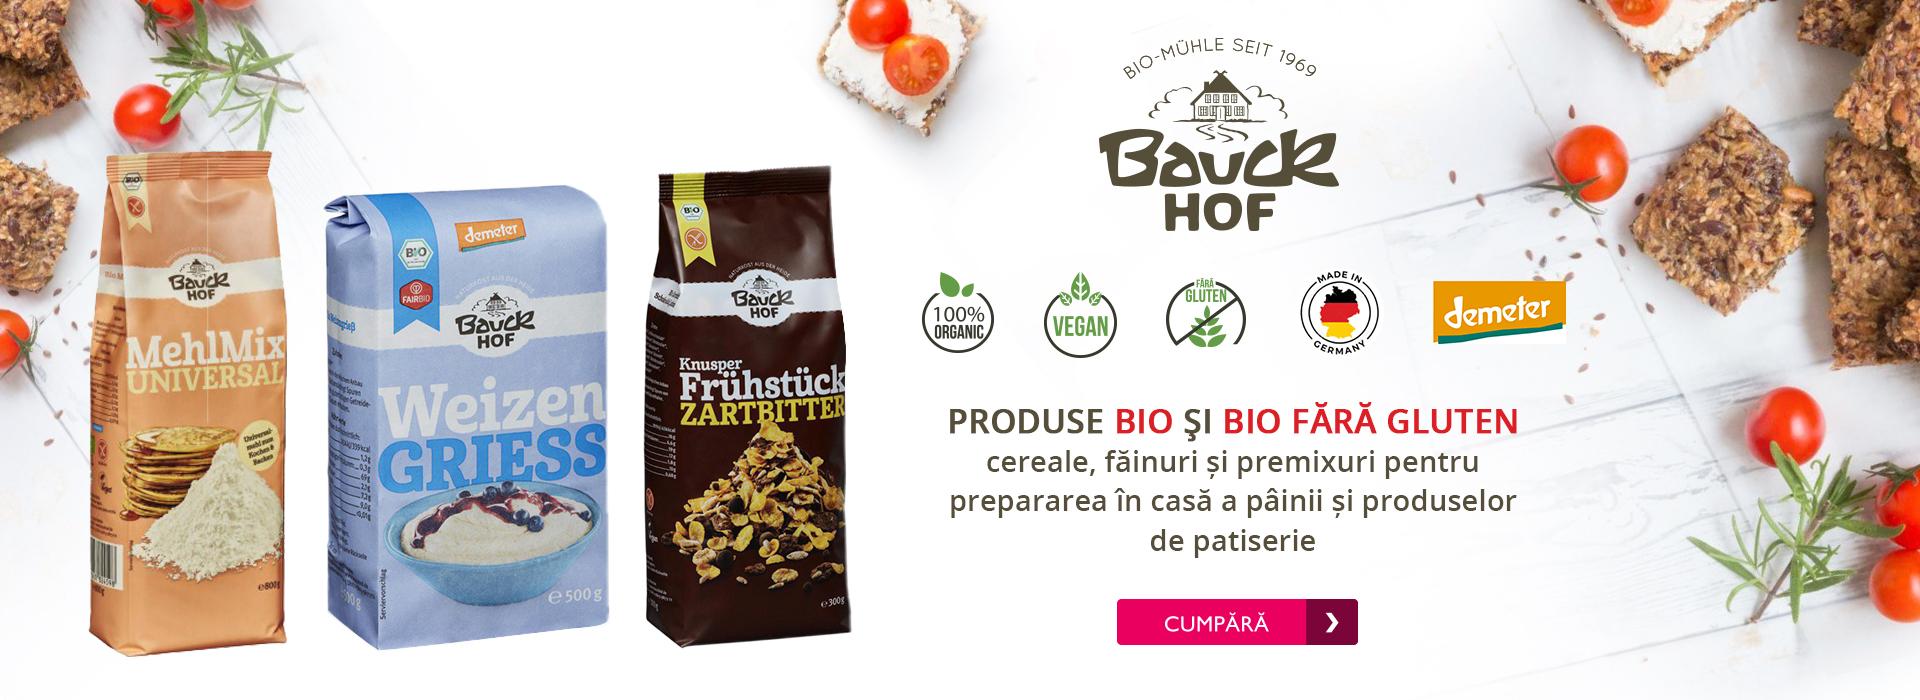 Bauckhof - aprilie 2020